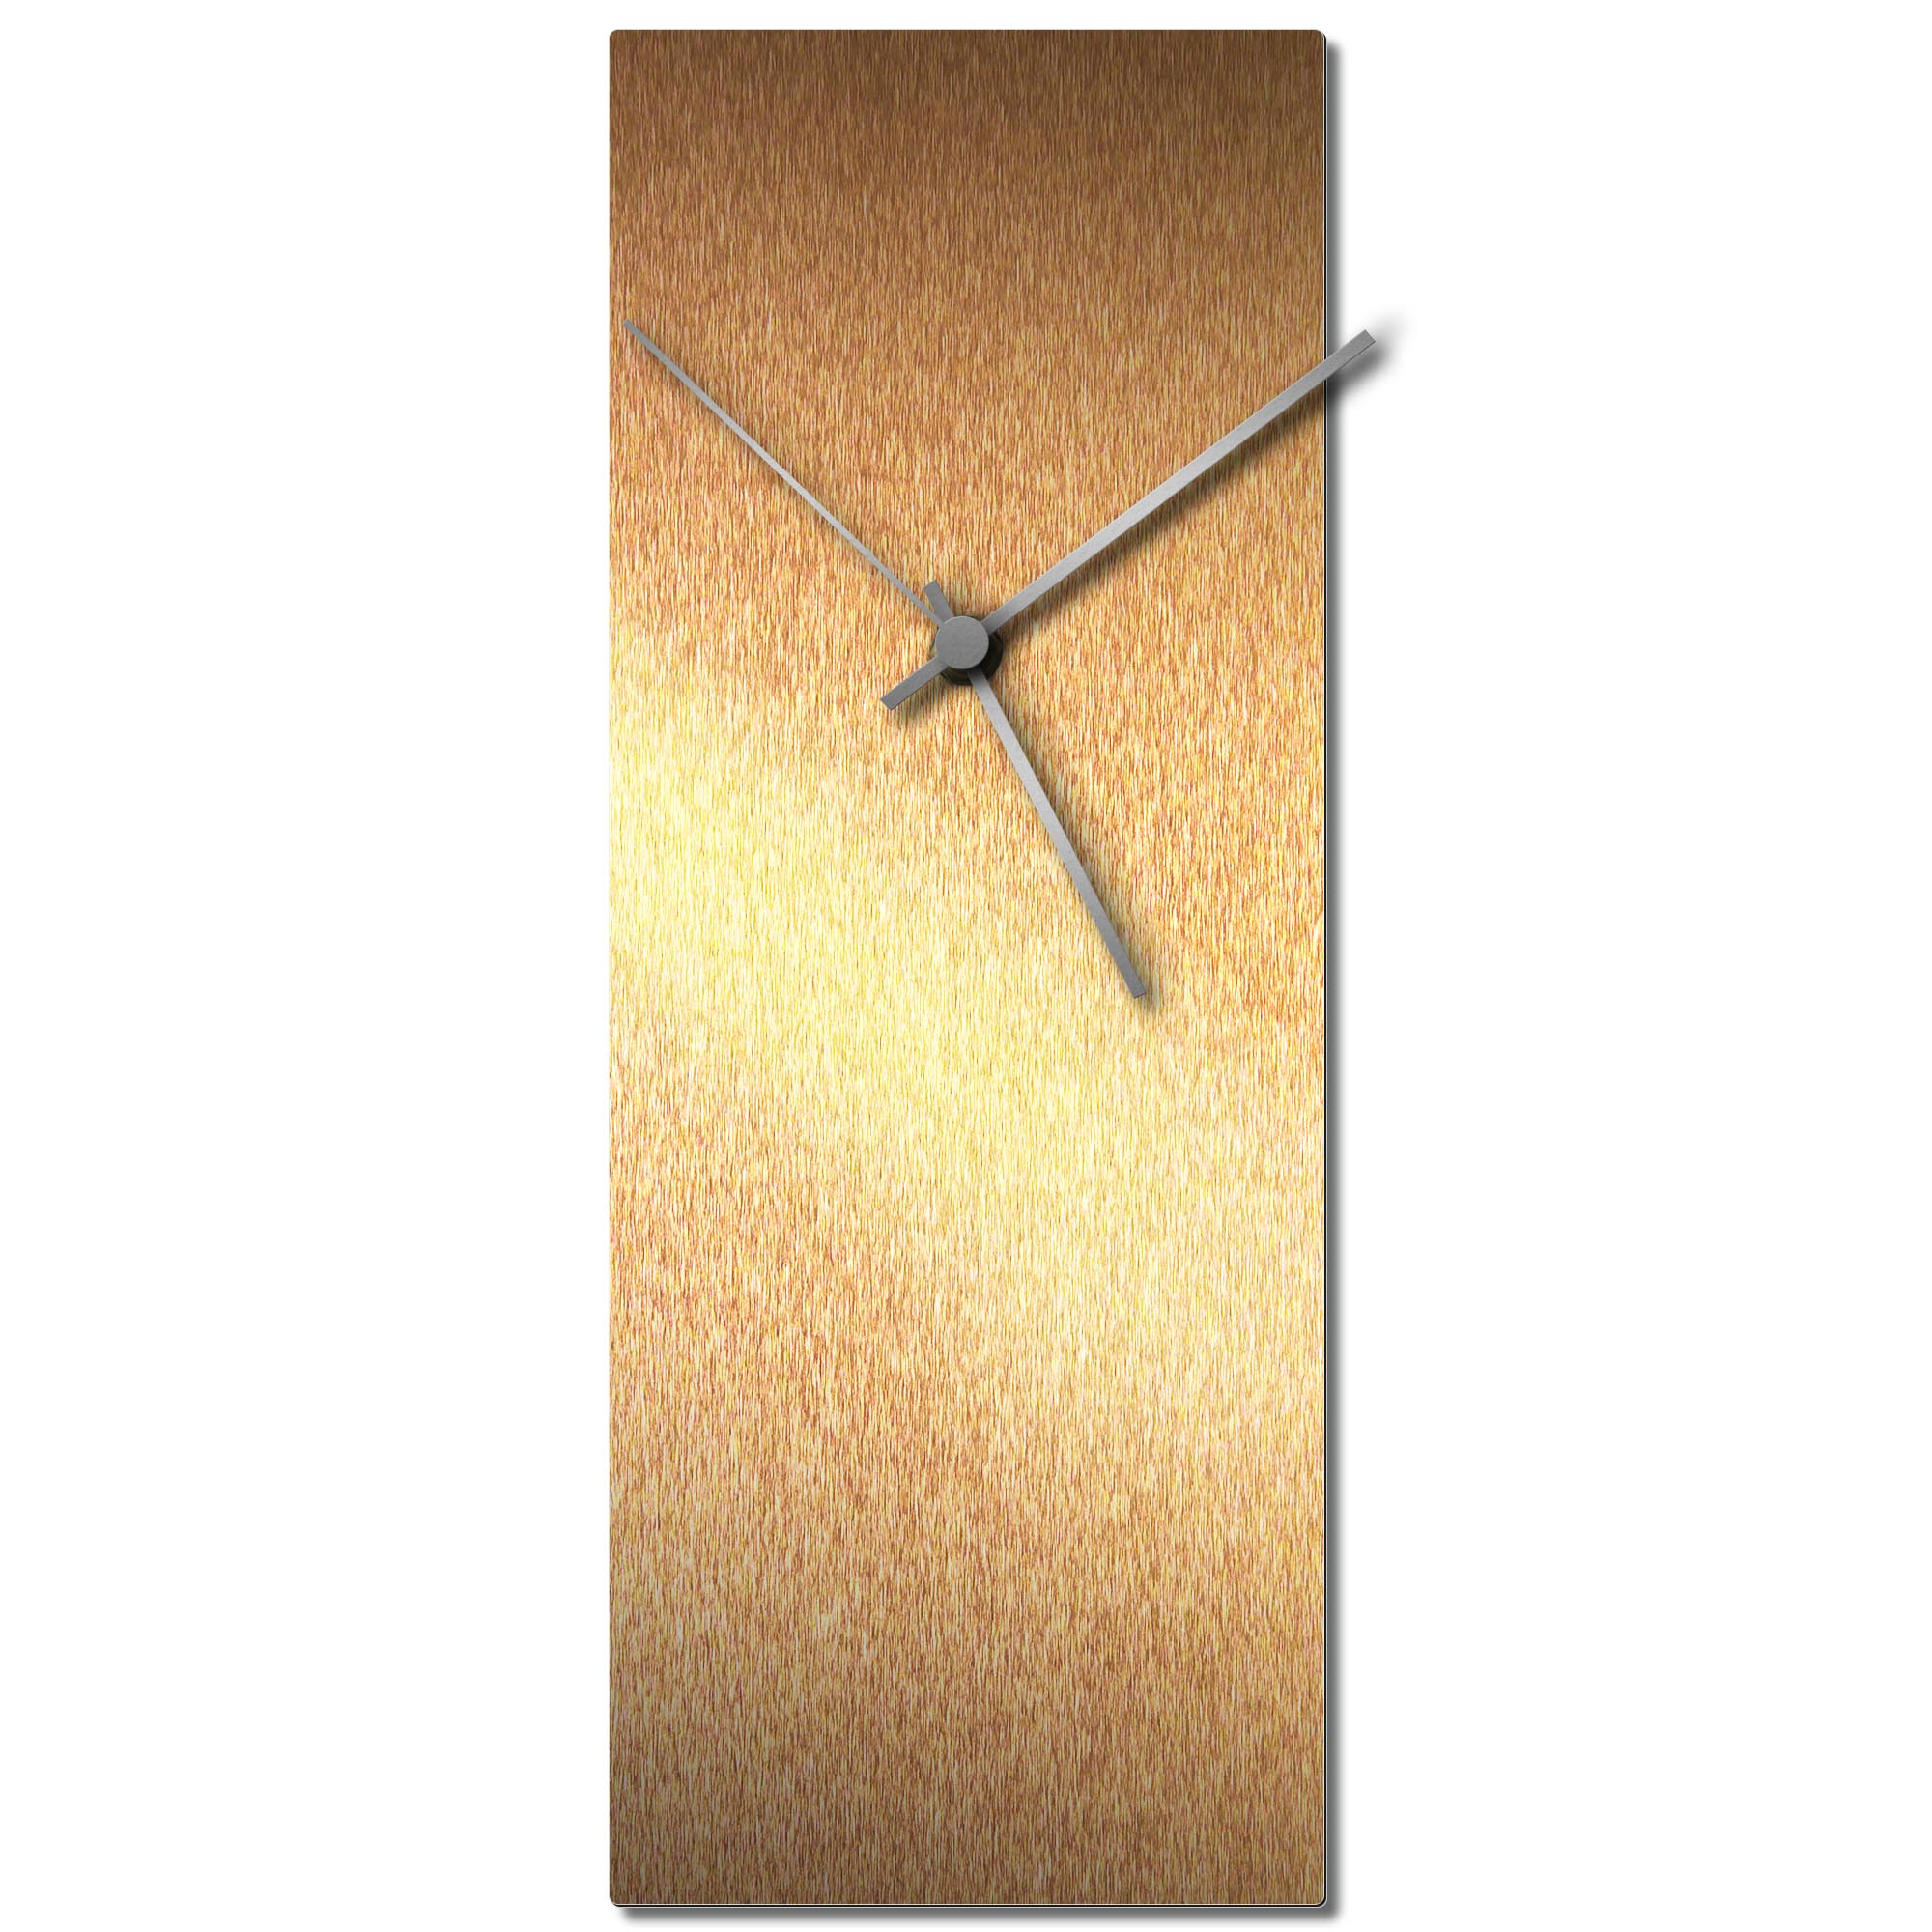 Adam Schwoeppe 'Bronzesmith Clock Silver' Midcentury Modern Style Wall Clock